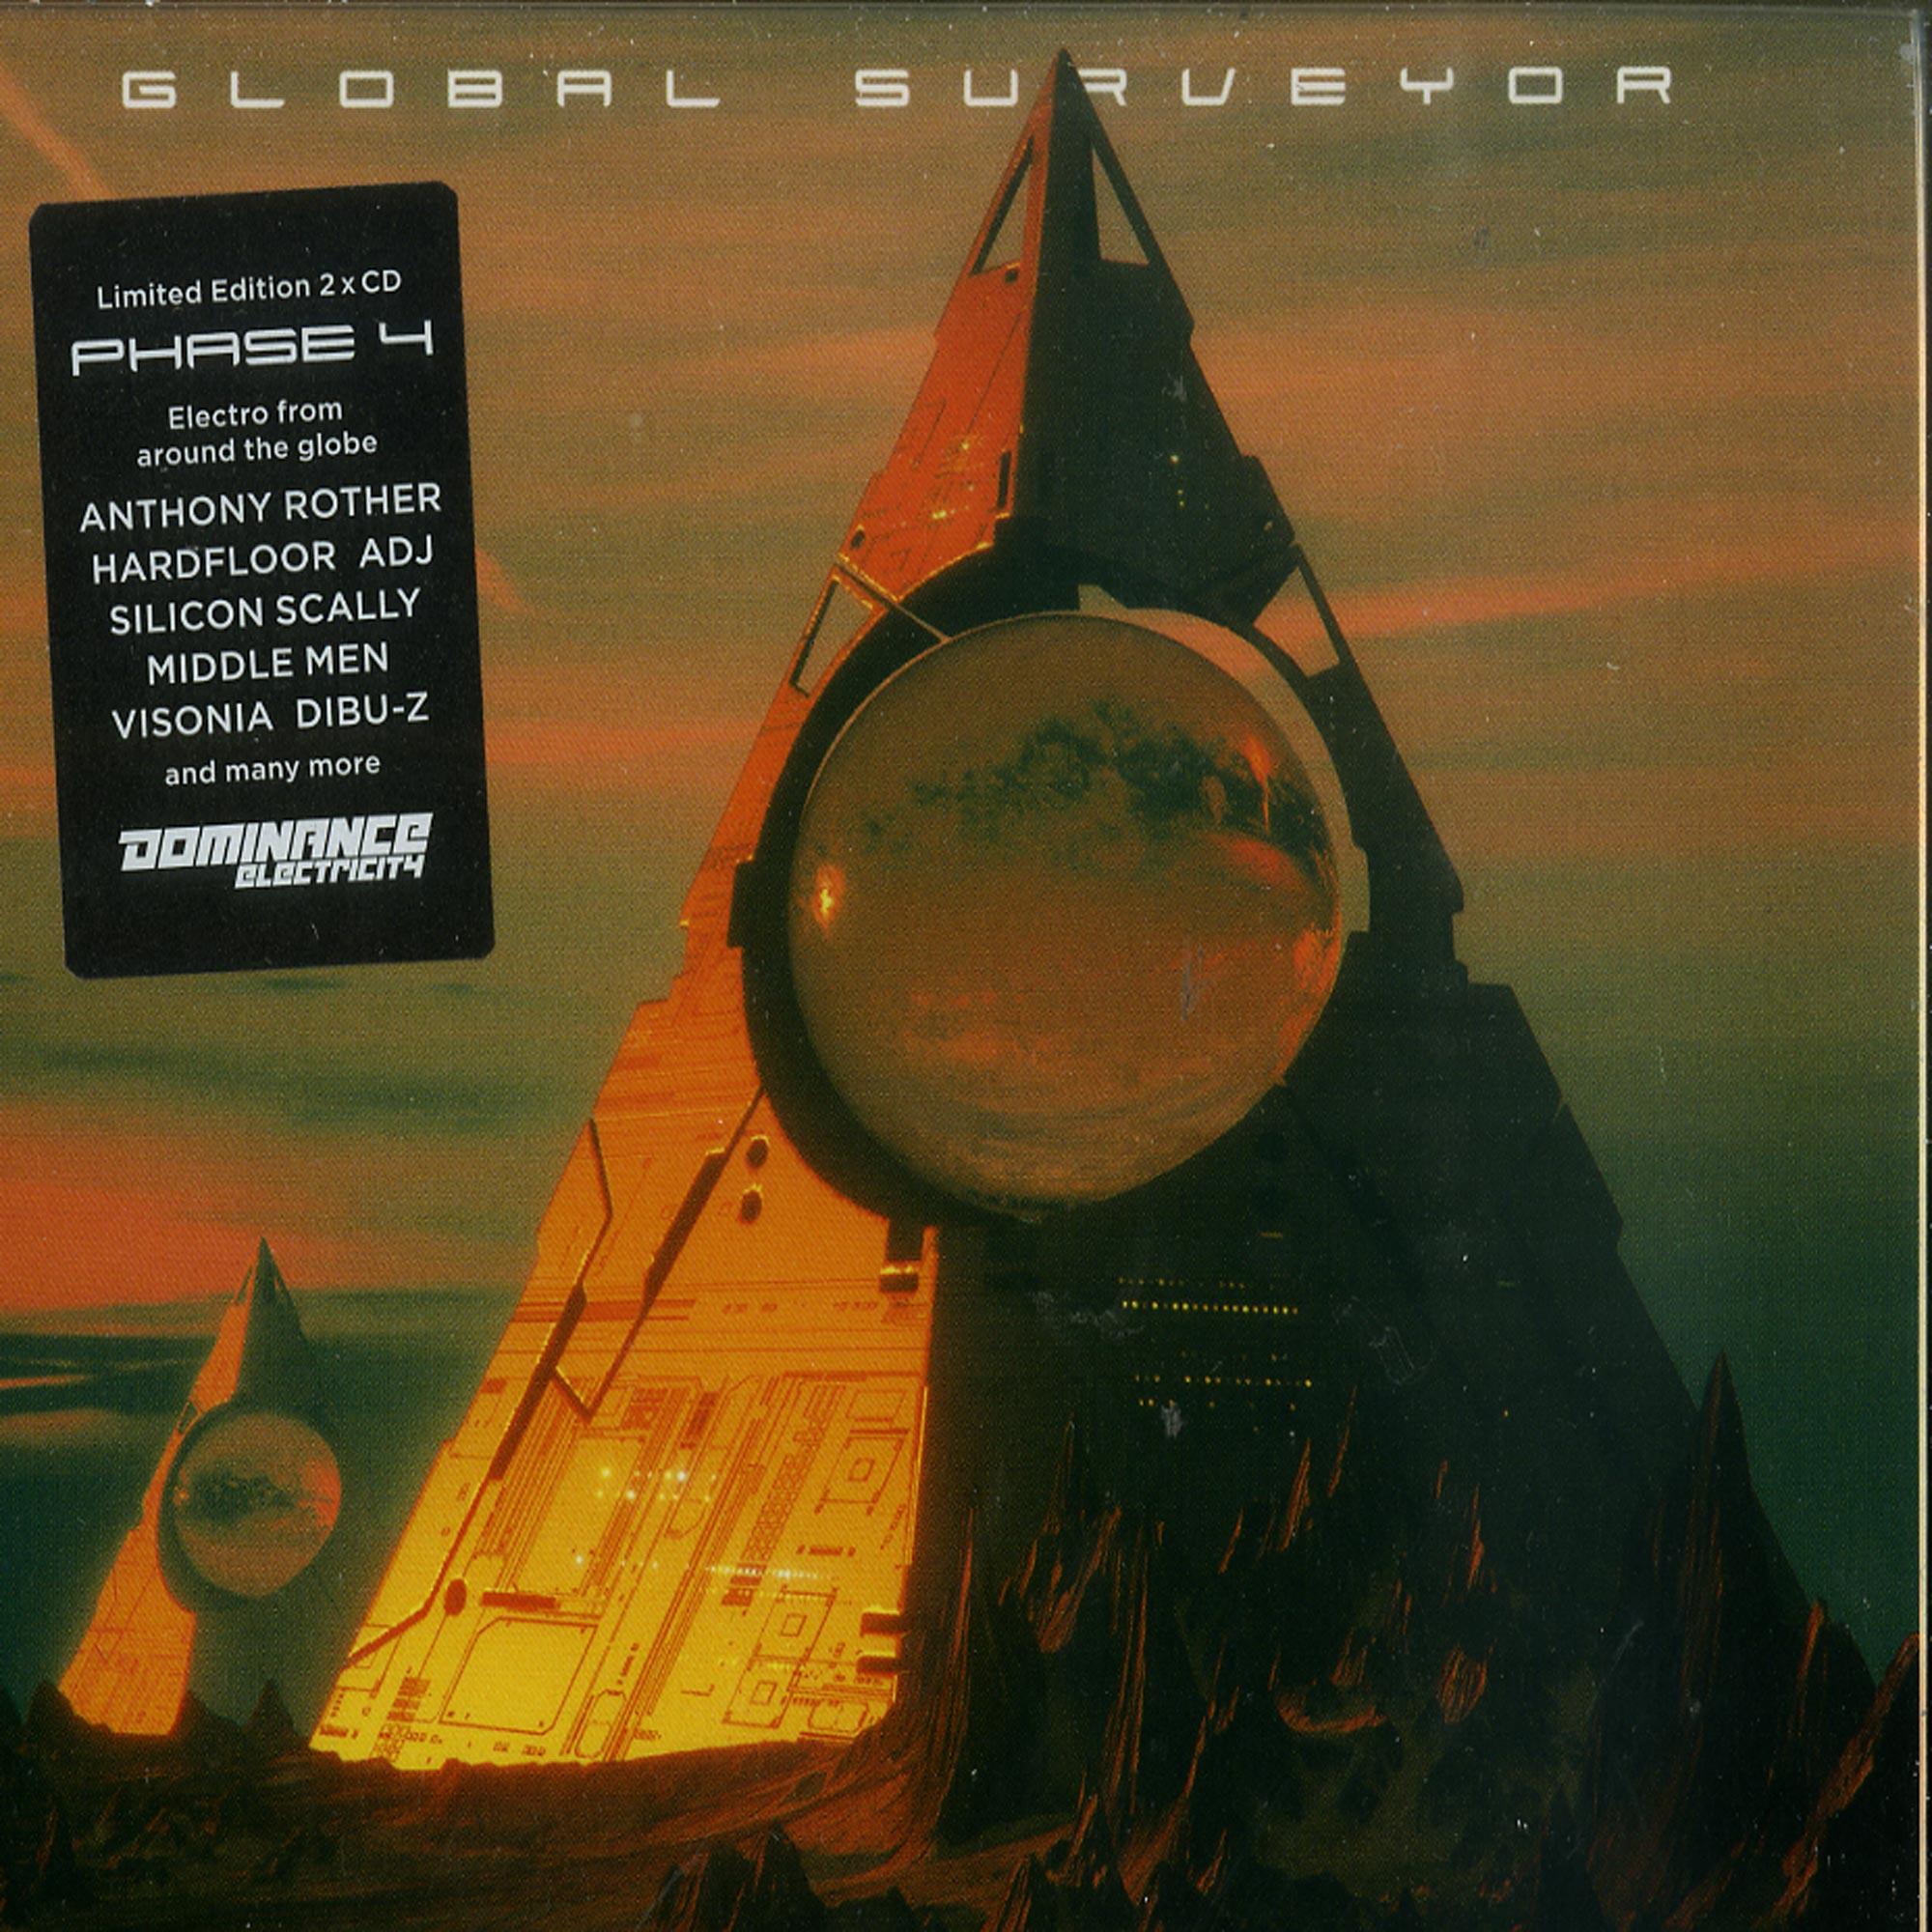 Various Arstists - GLOBAL SURVEYOR 4